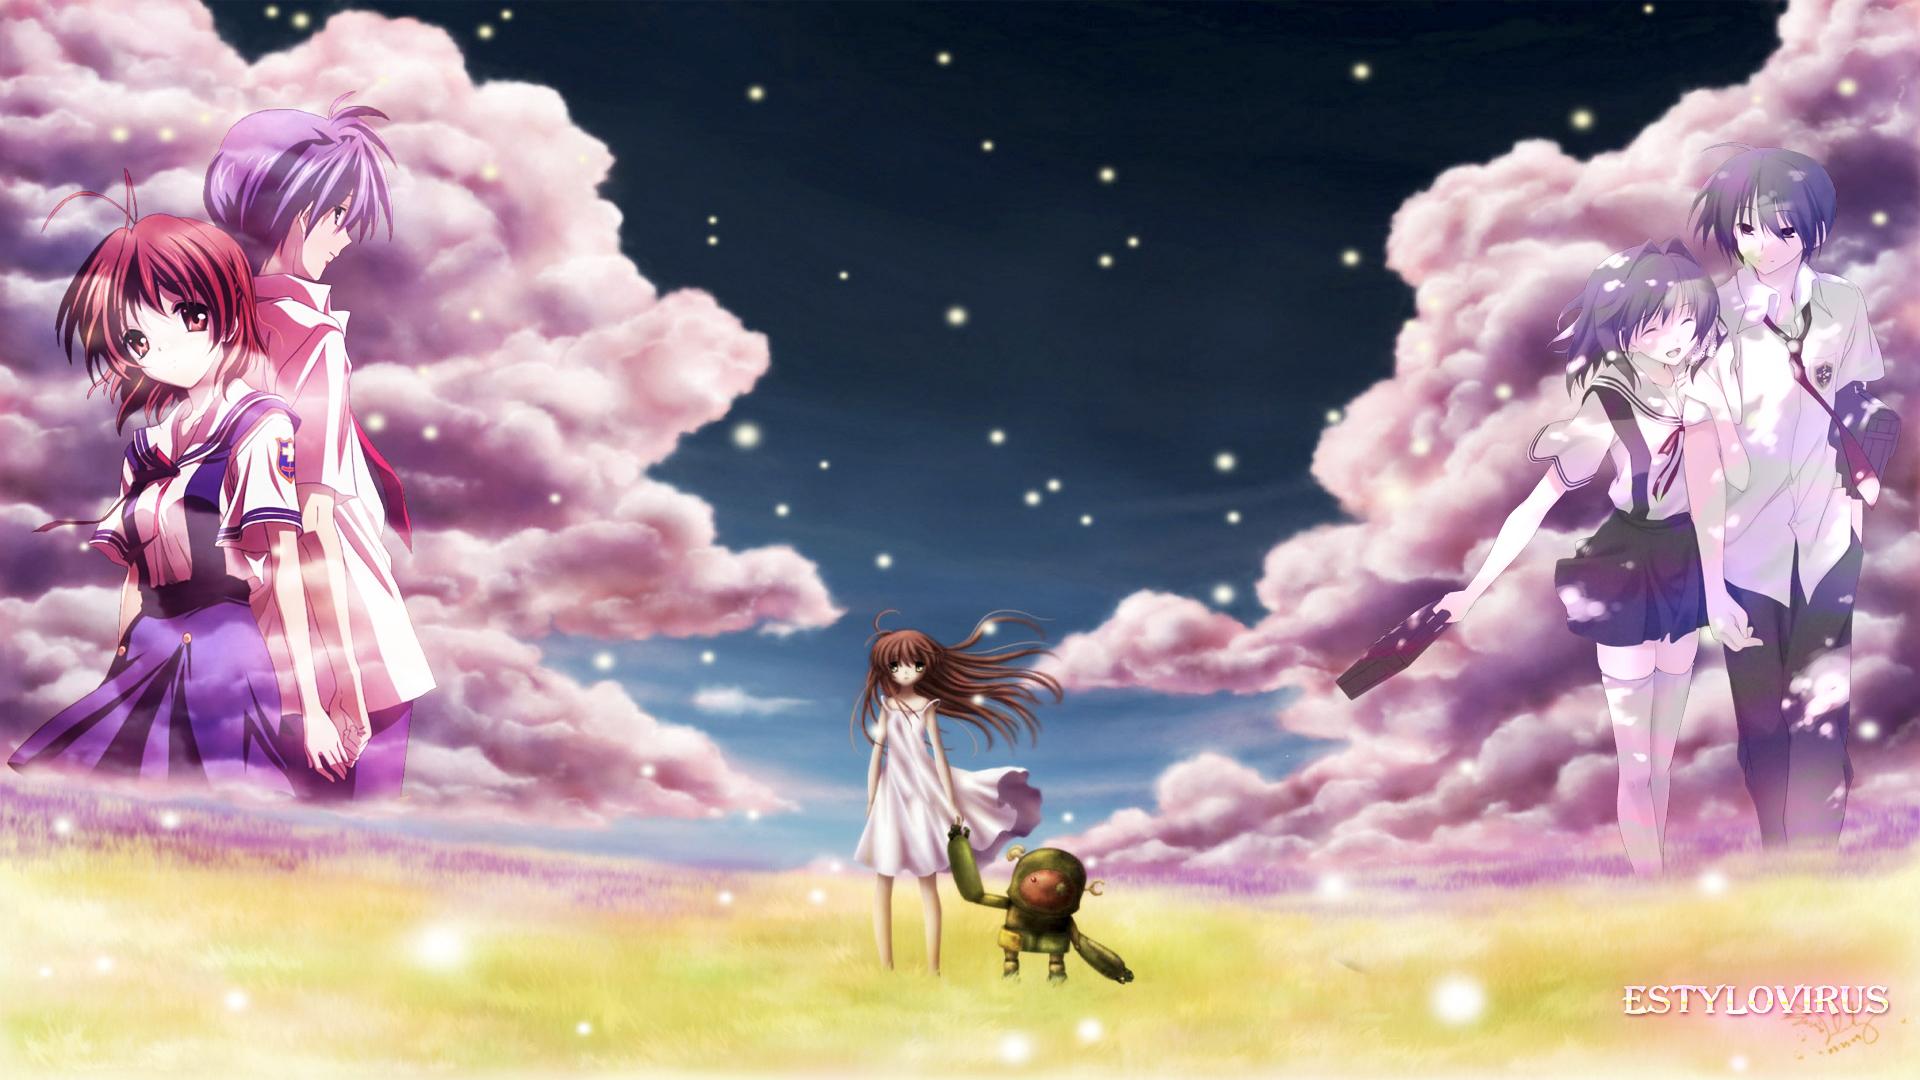 Clannad After Story Wallpaper - WallpaperSafari